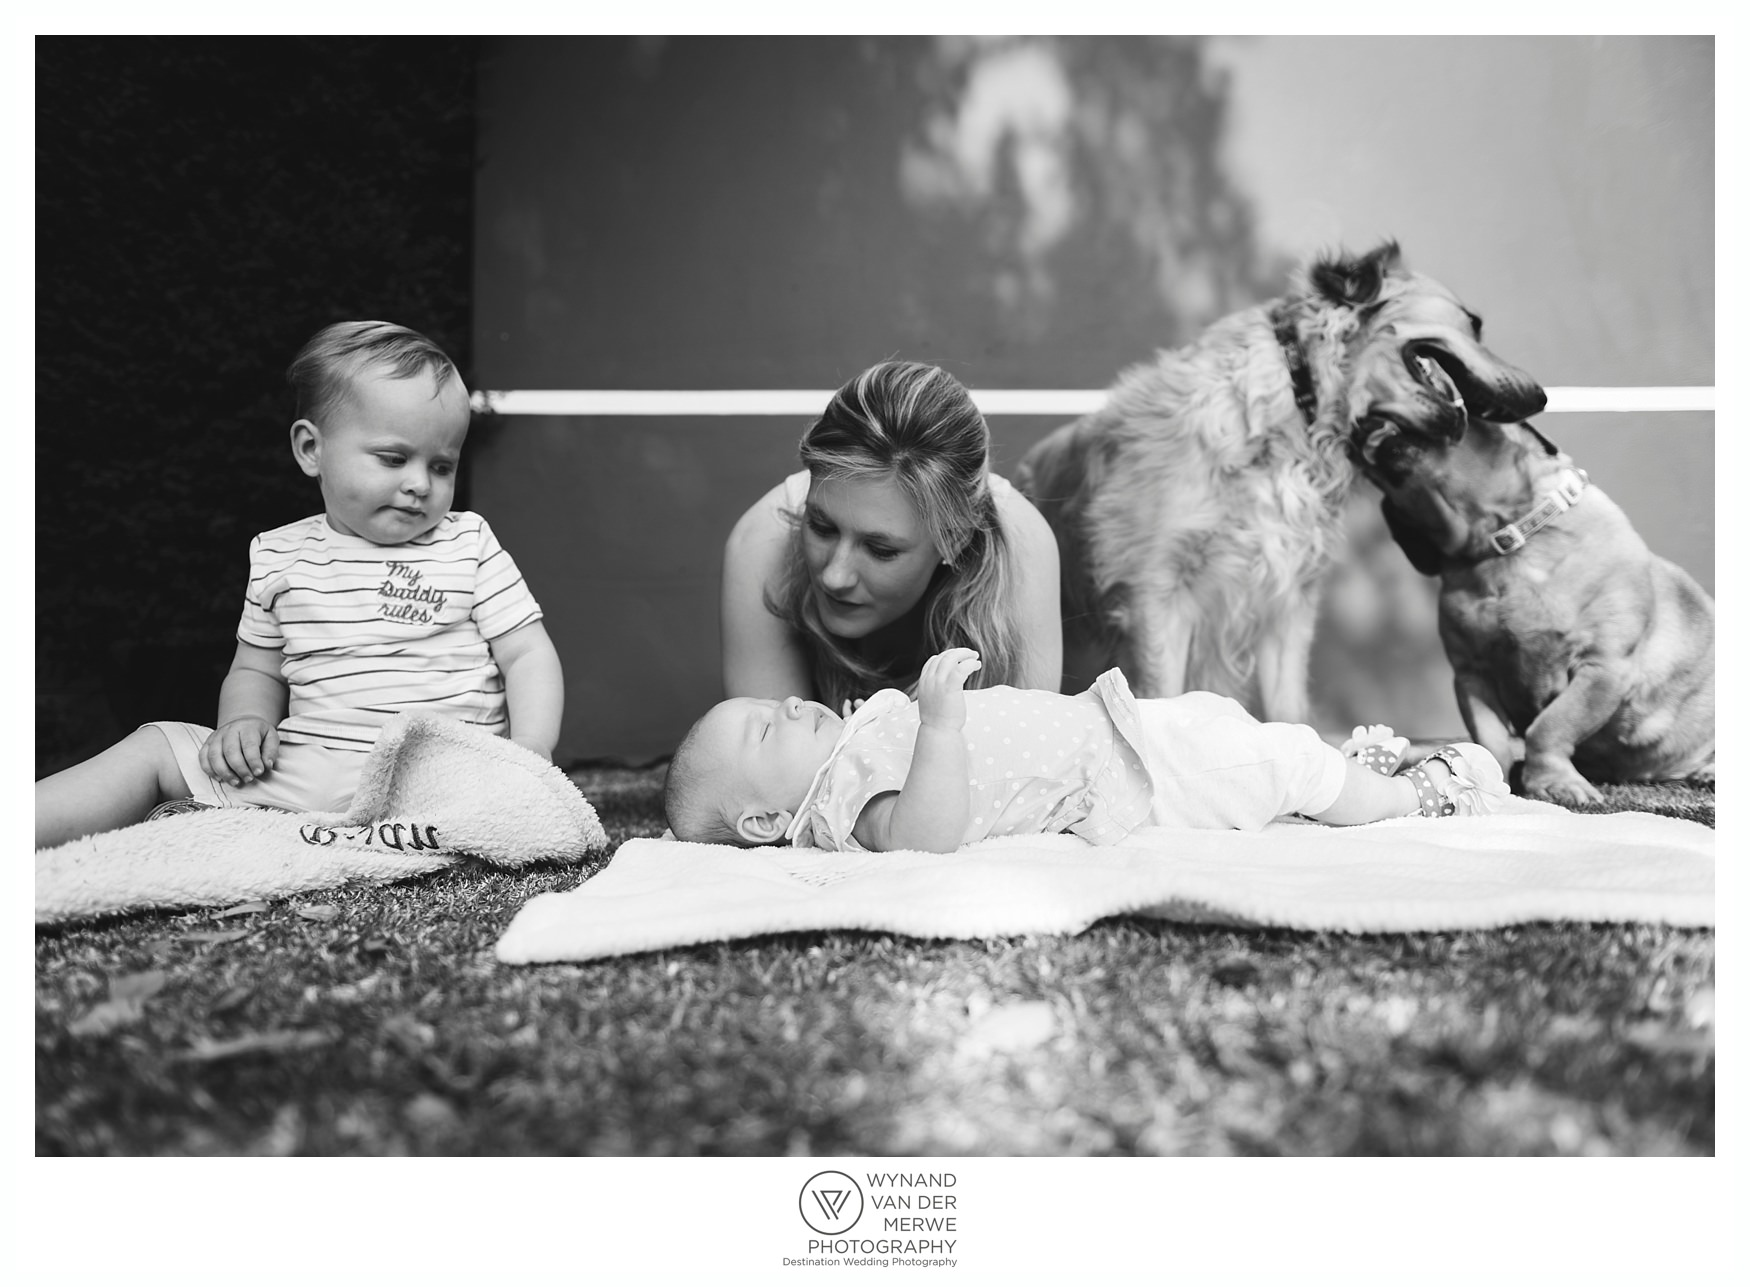 Wynandvandermerwe kirsten robert family lifestyle photography benoni location gauteng-62.jpg